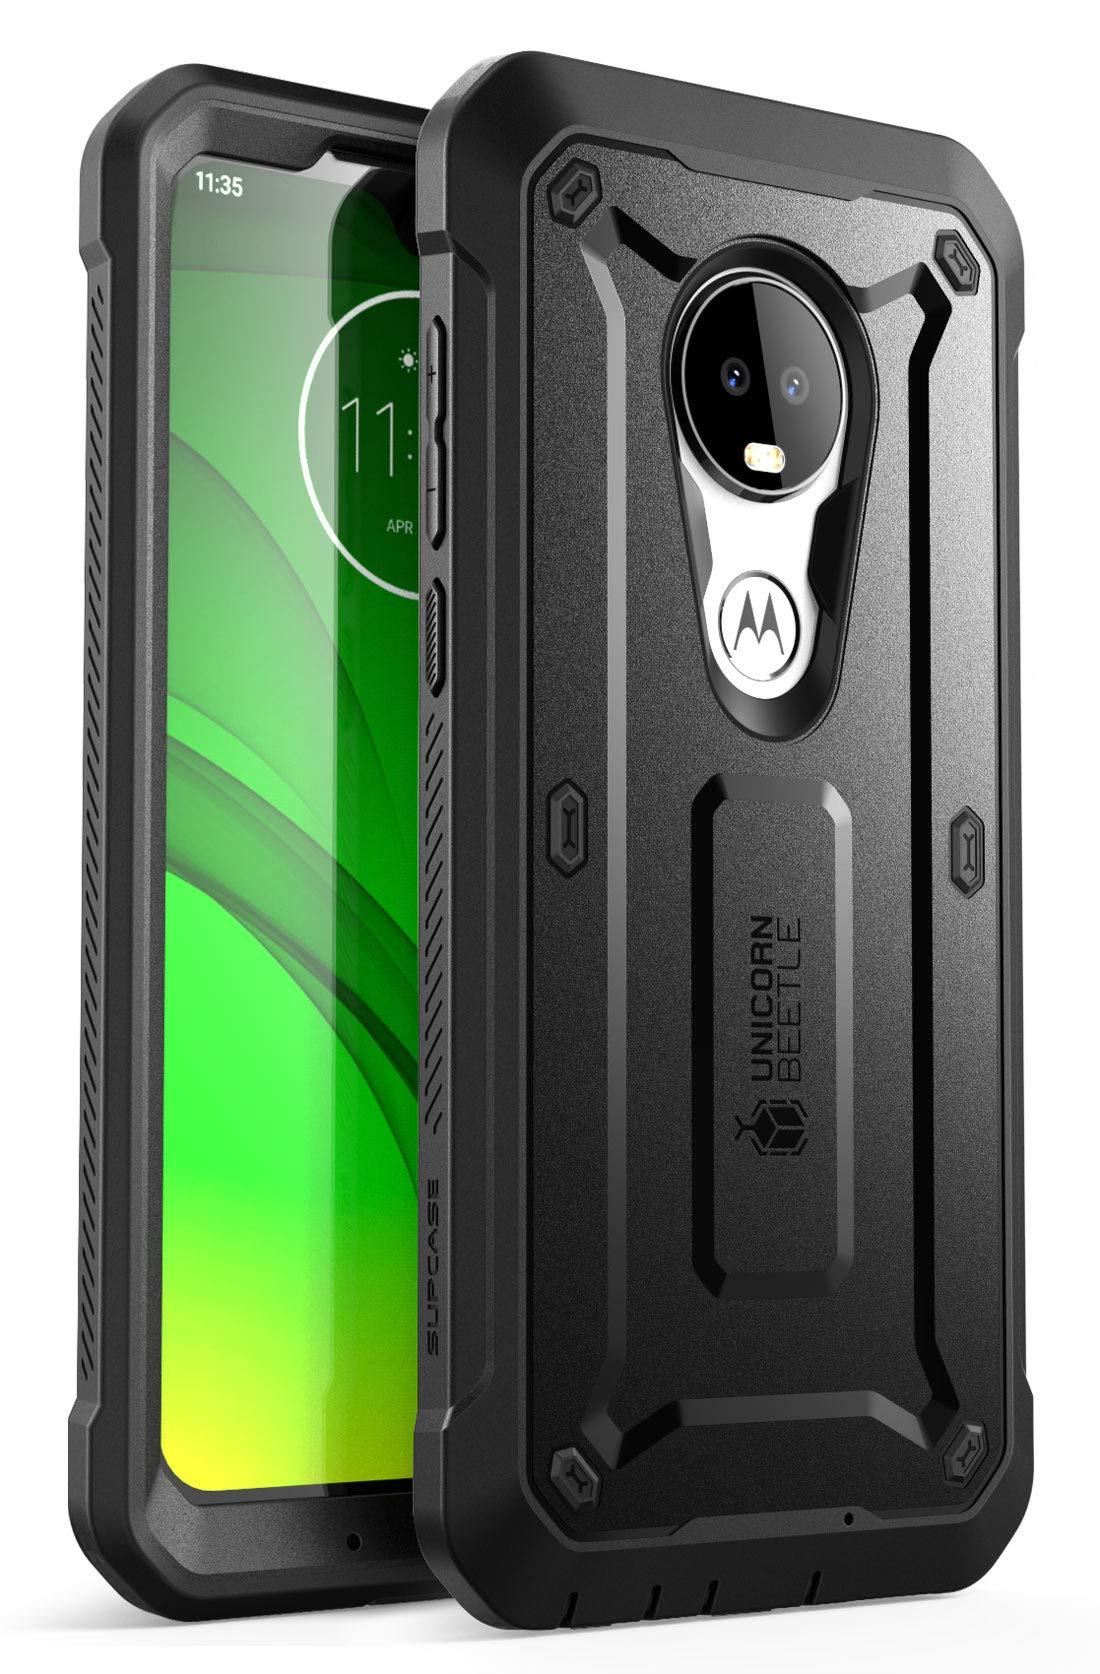 Funda Para Moto G7 Plus Supcase (7q4nbrcl)